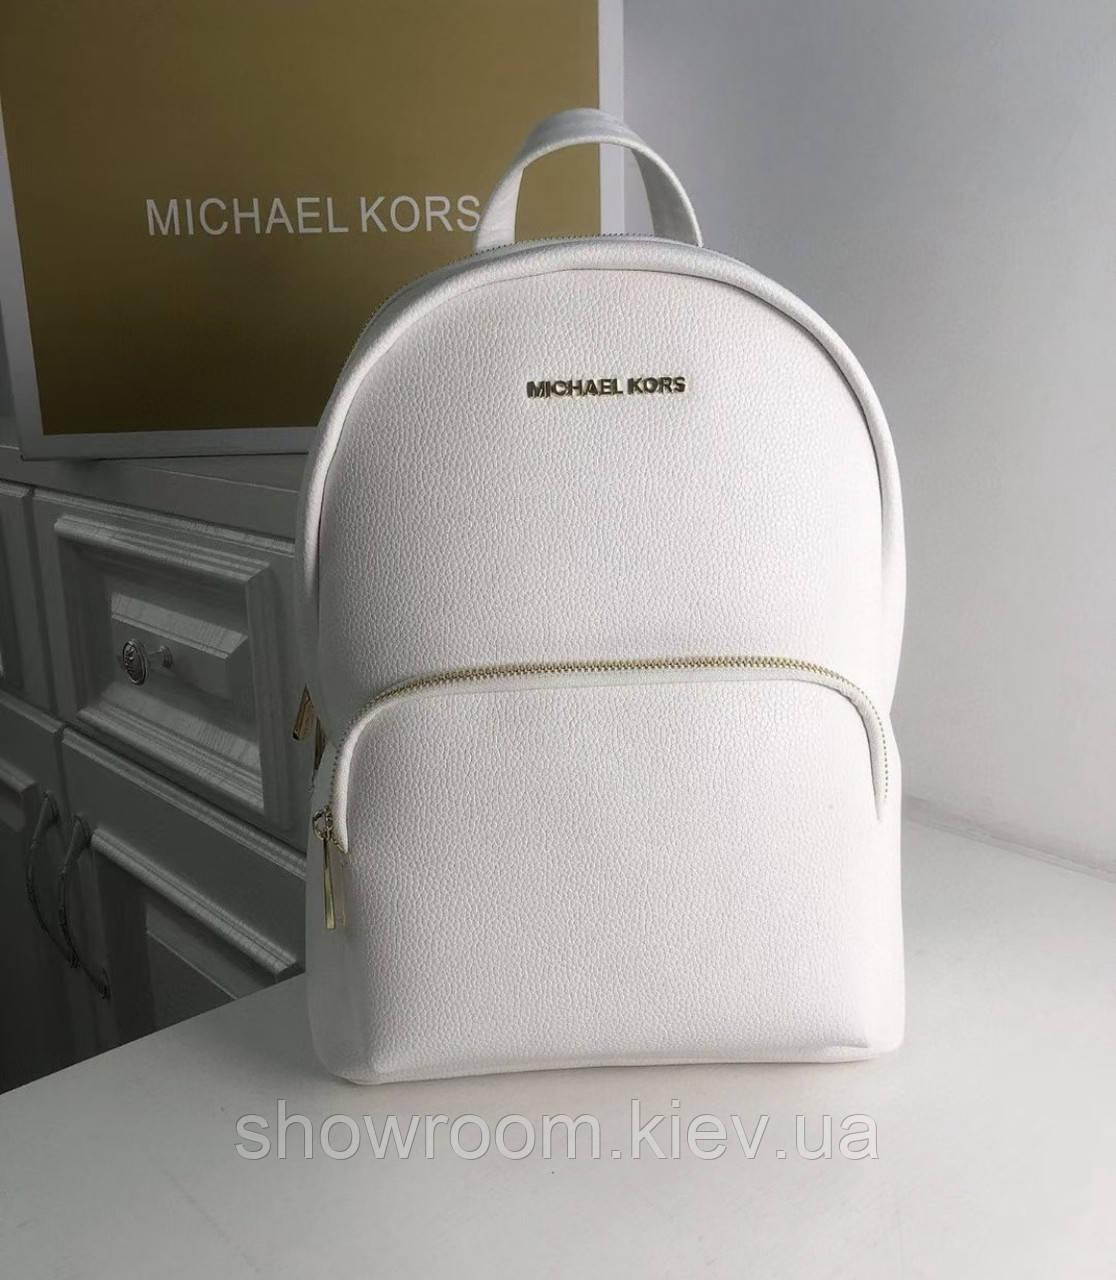 Женский кожаный рюкзак Michael Kors 2021 white-rose Lux